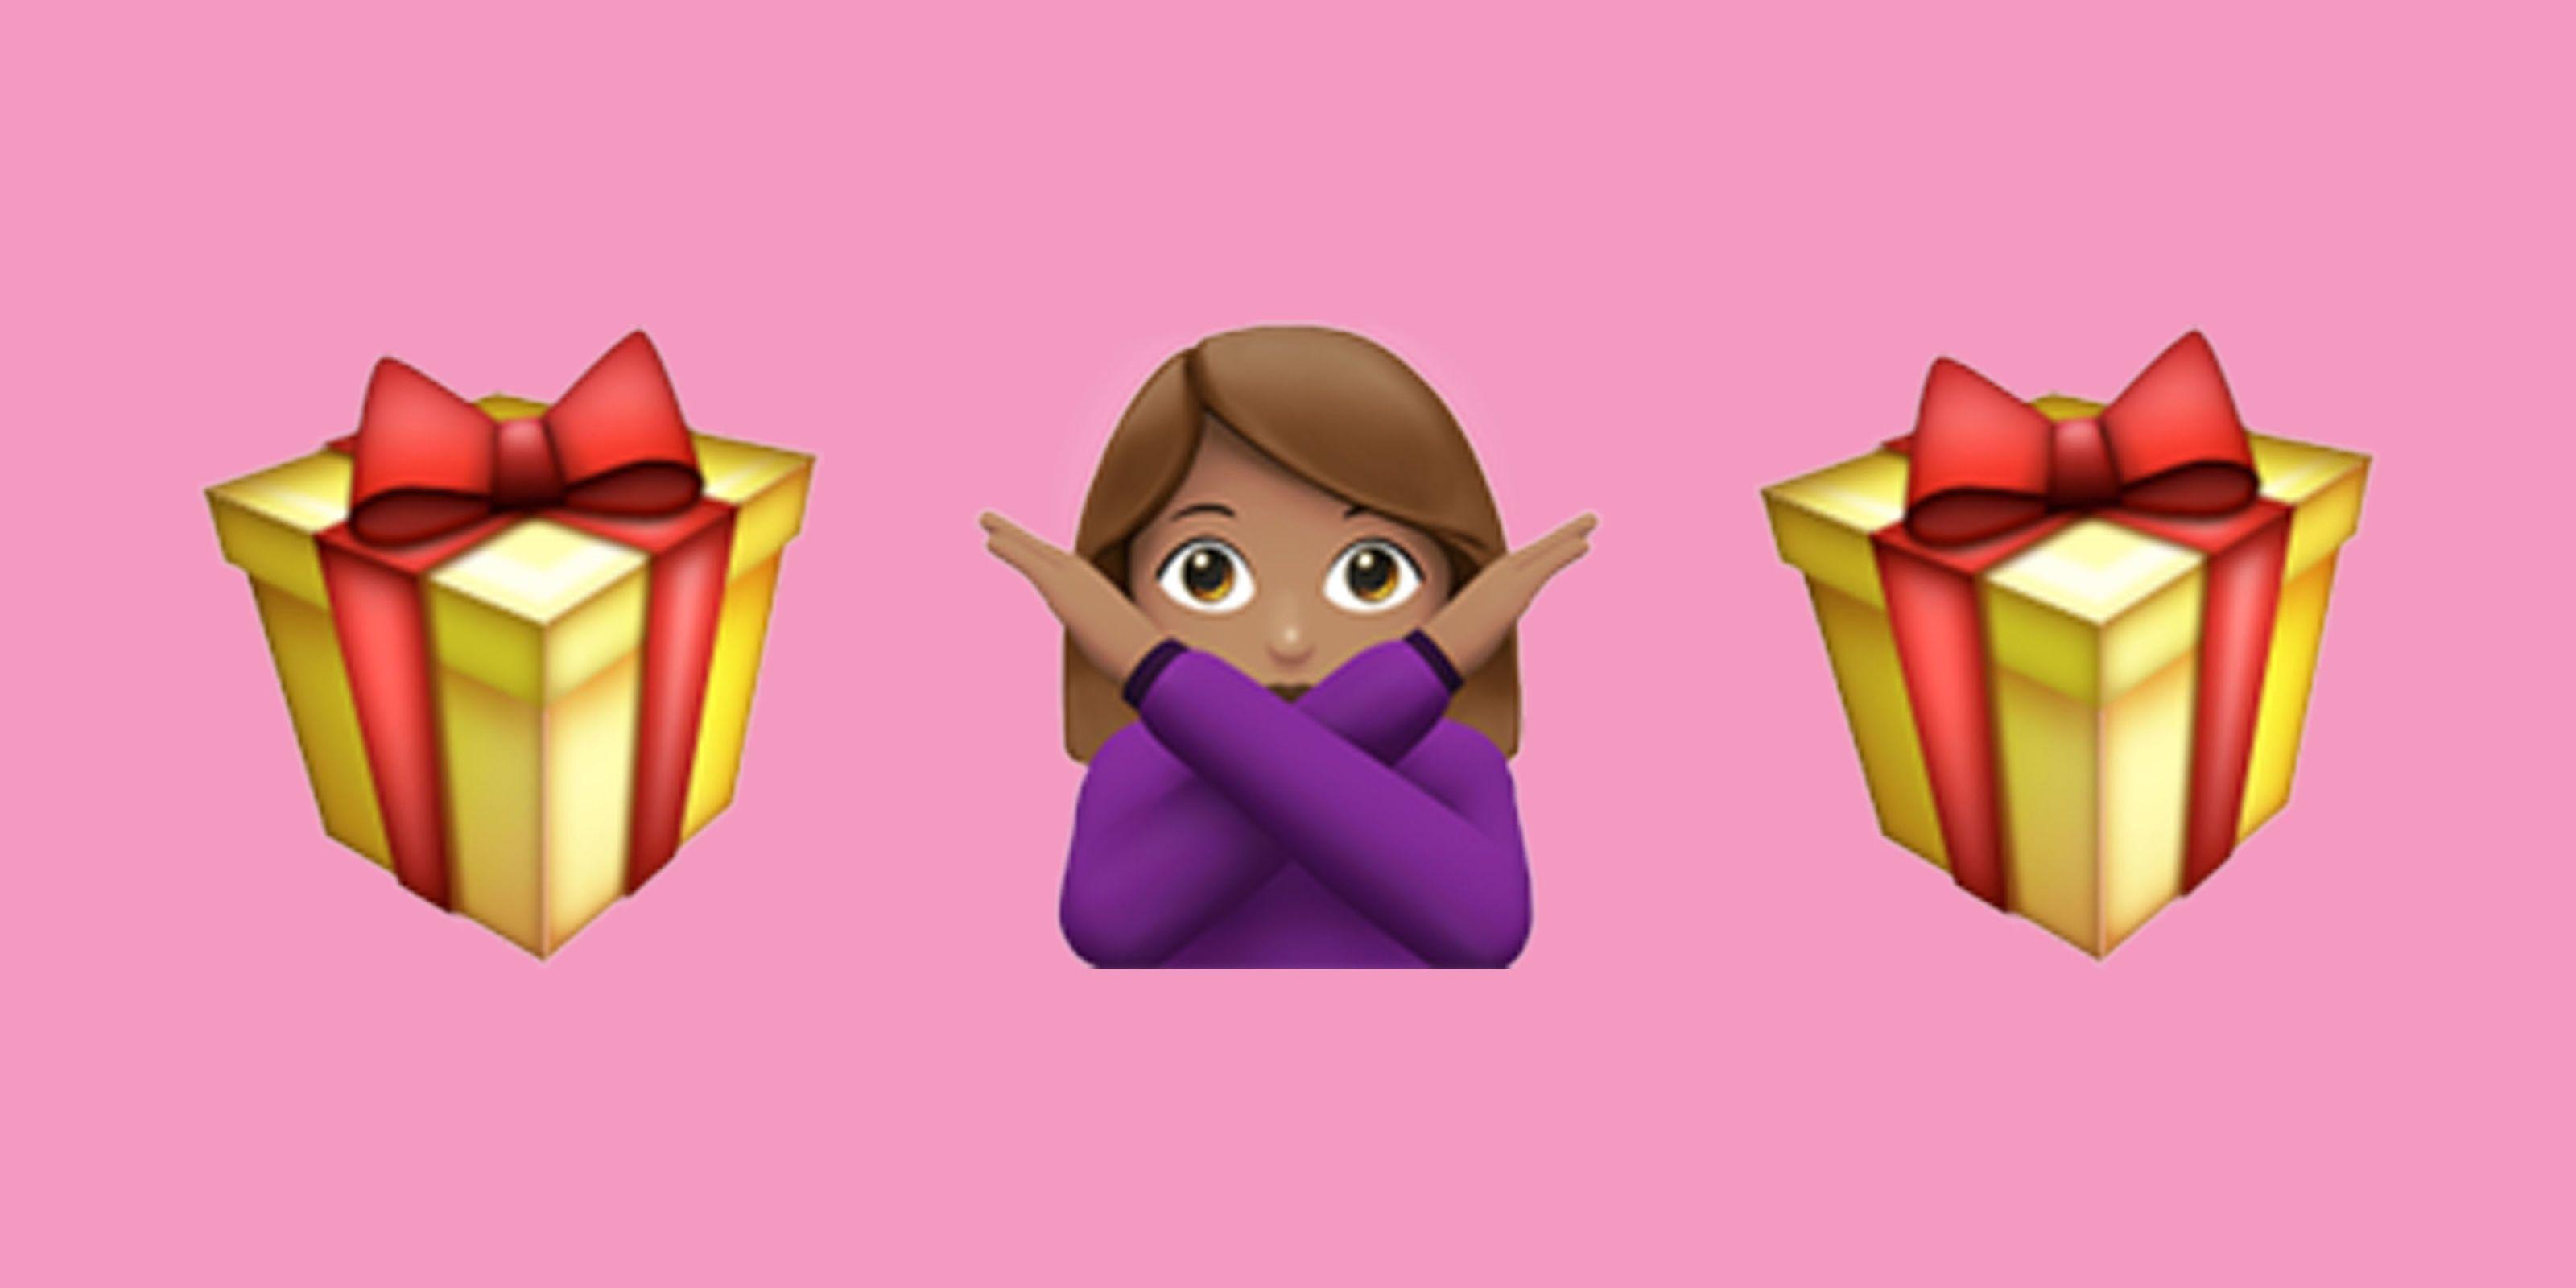 Useless xmas gifts for teachers